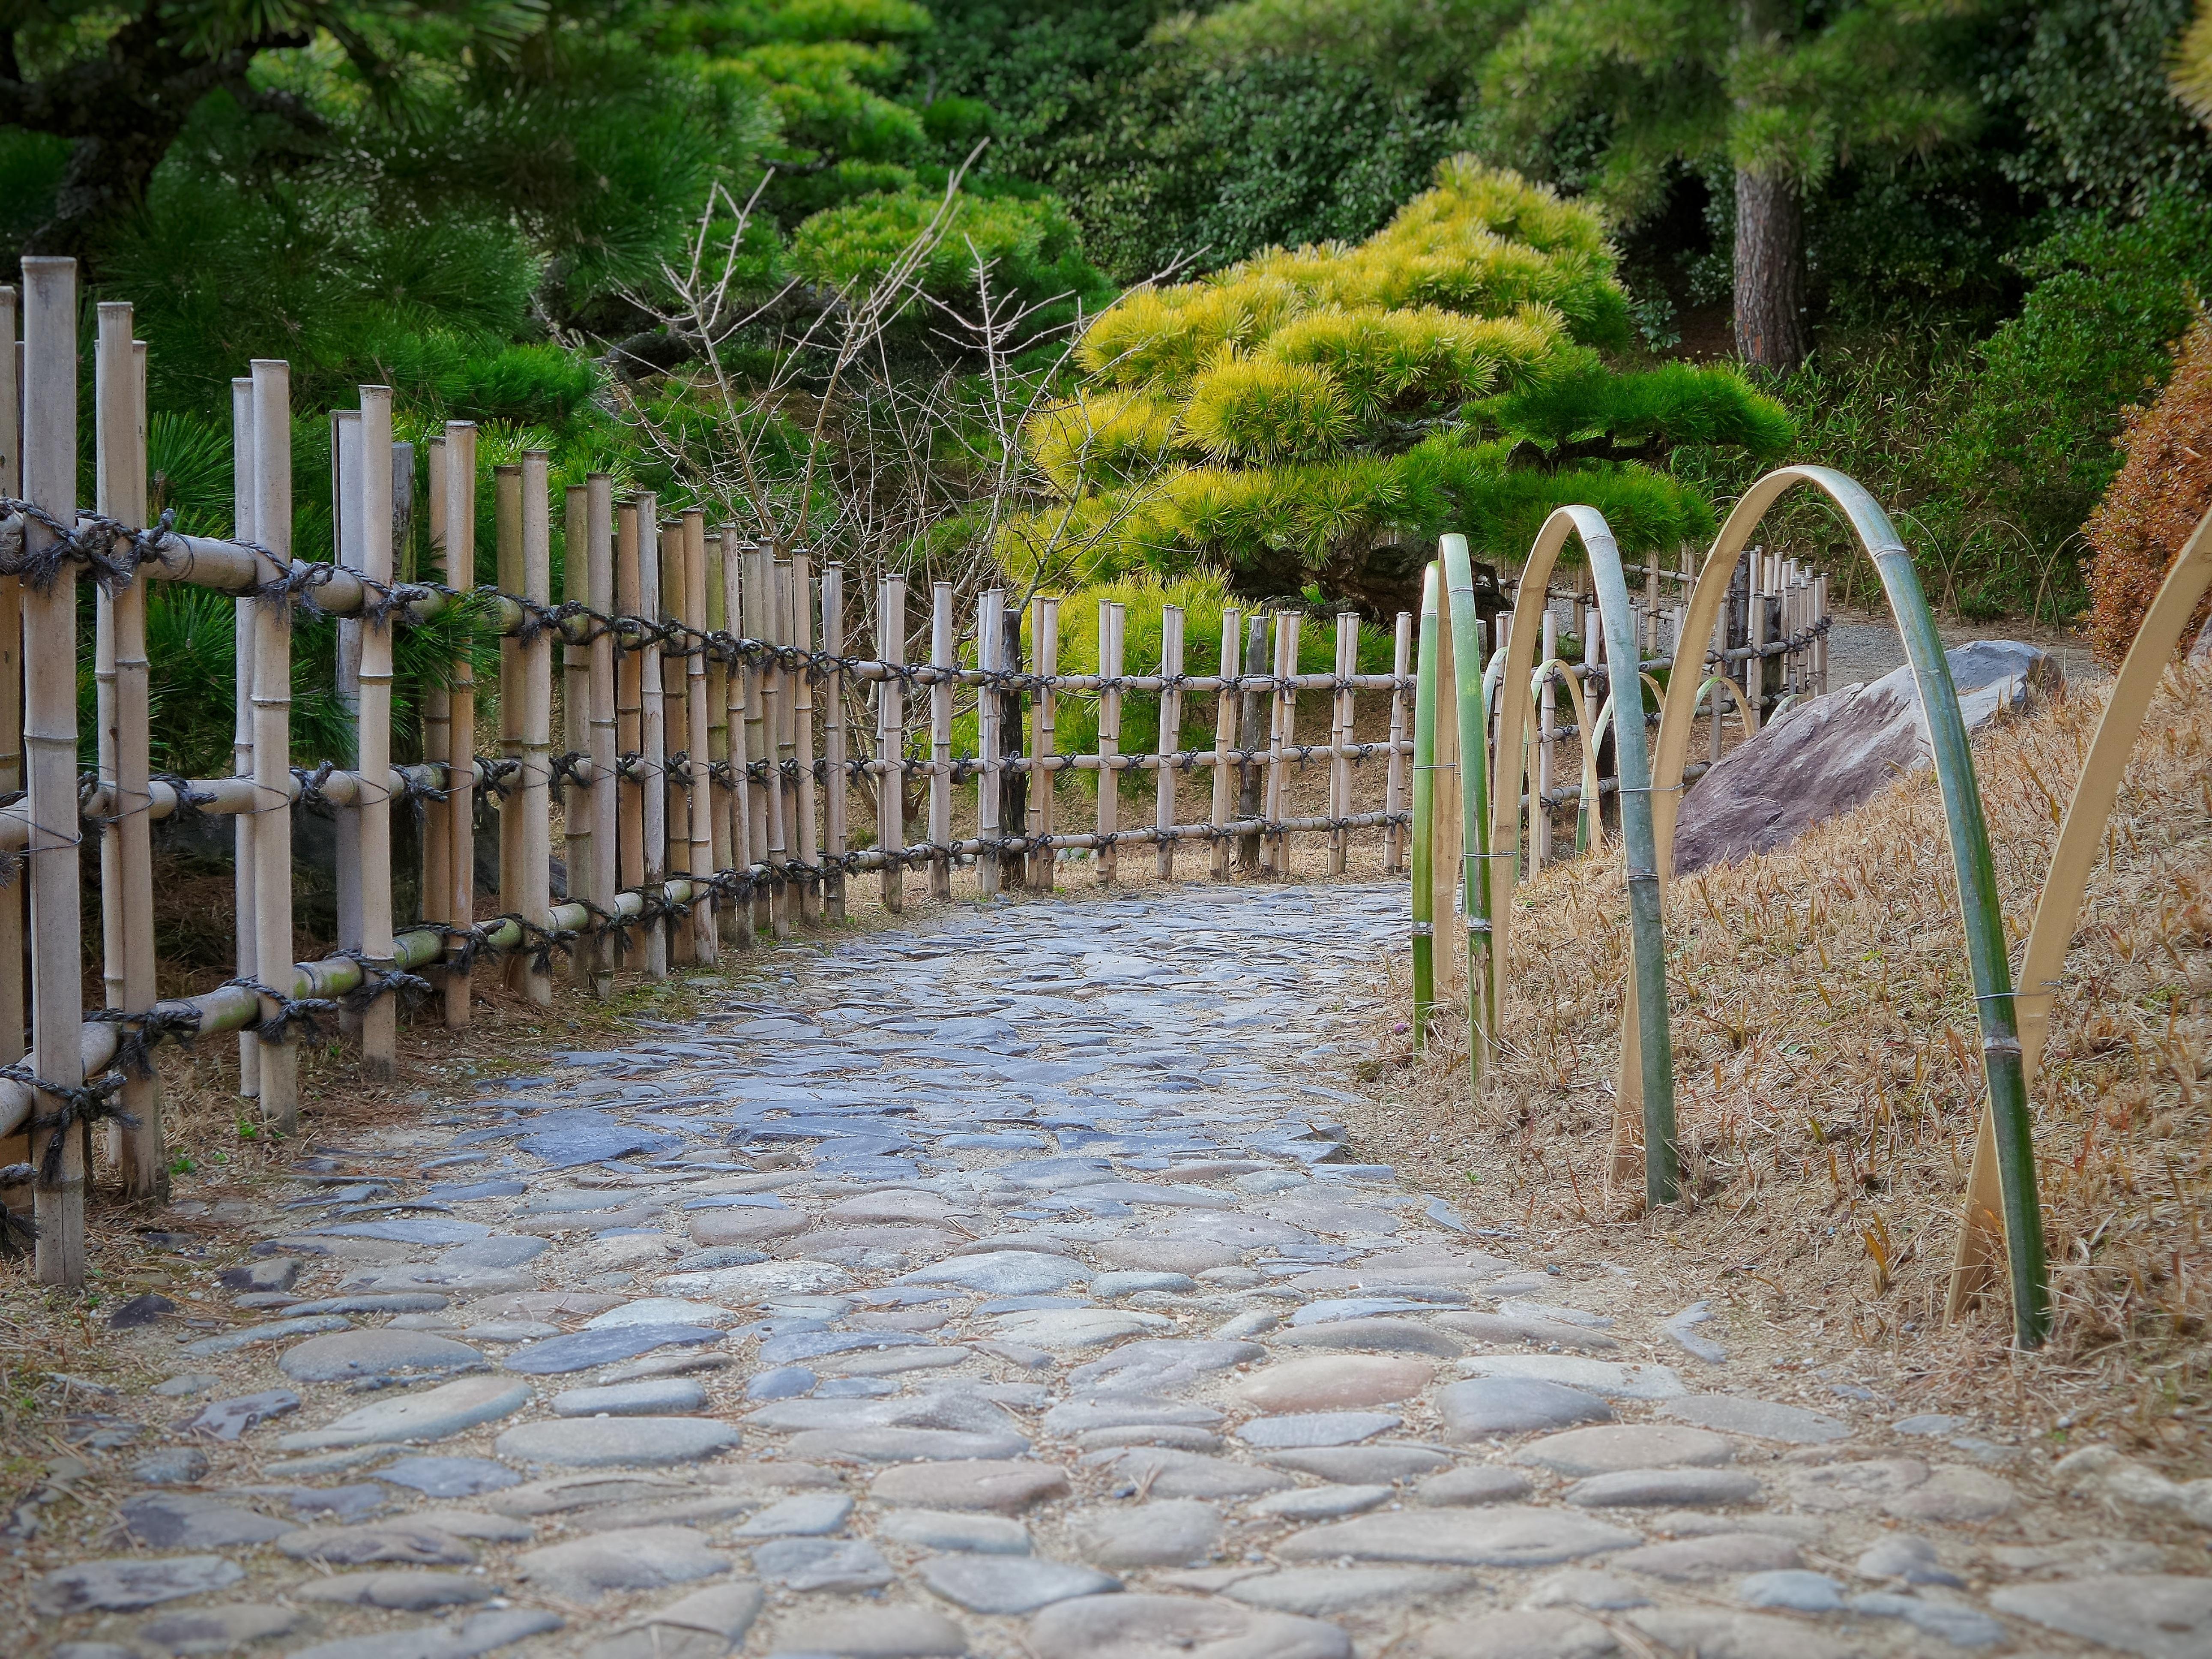 Kostenlose foto Pfad Zaun Mauer Fluss Gehweg Grün Garten